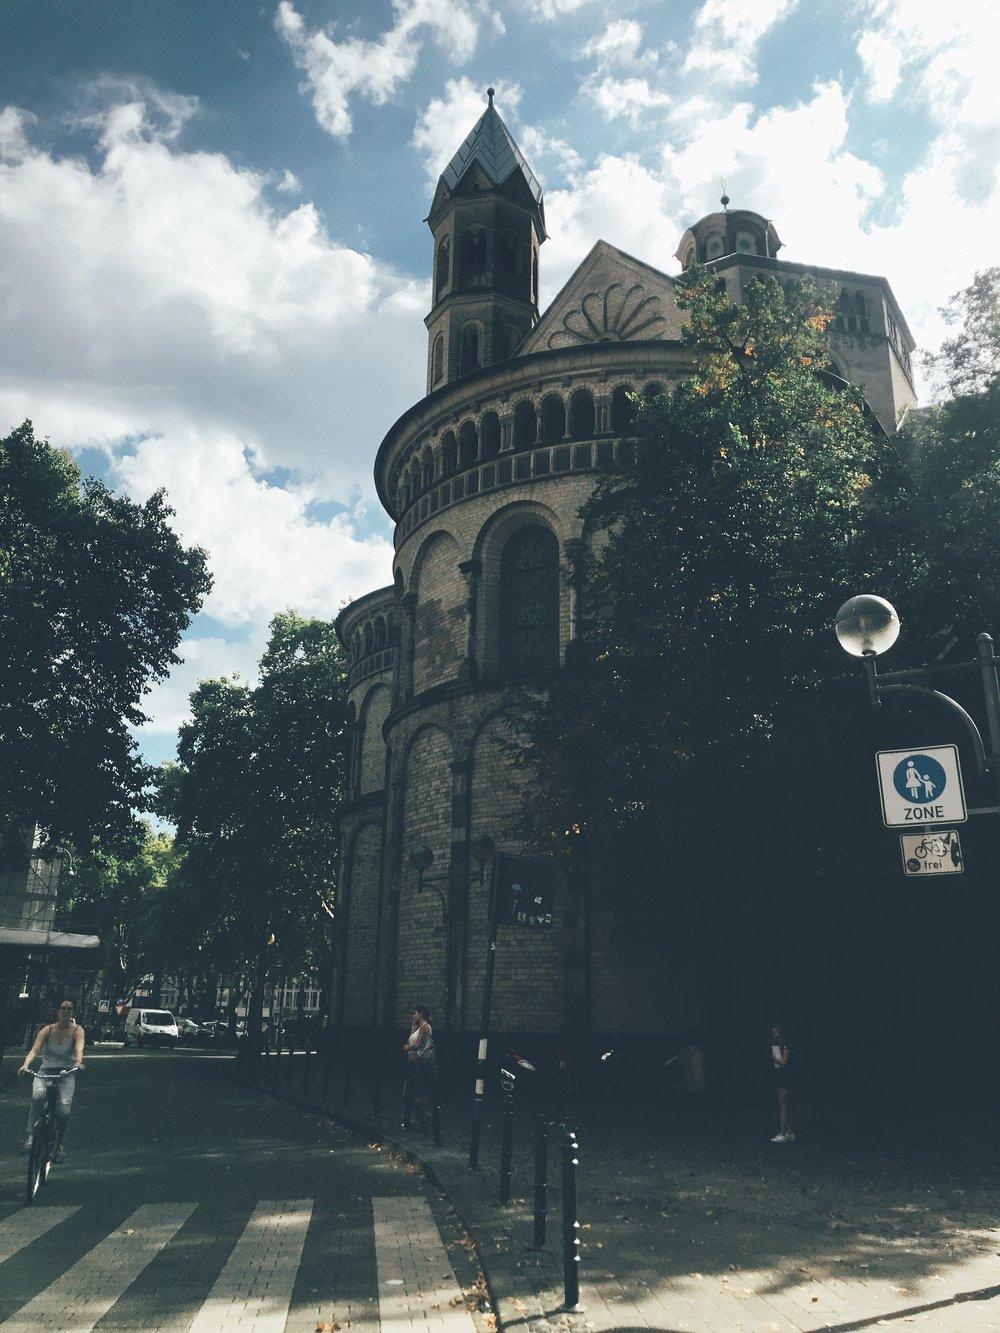 Koeln - Germany